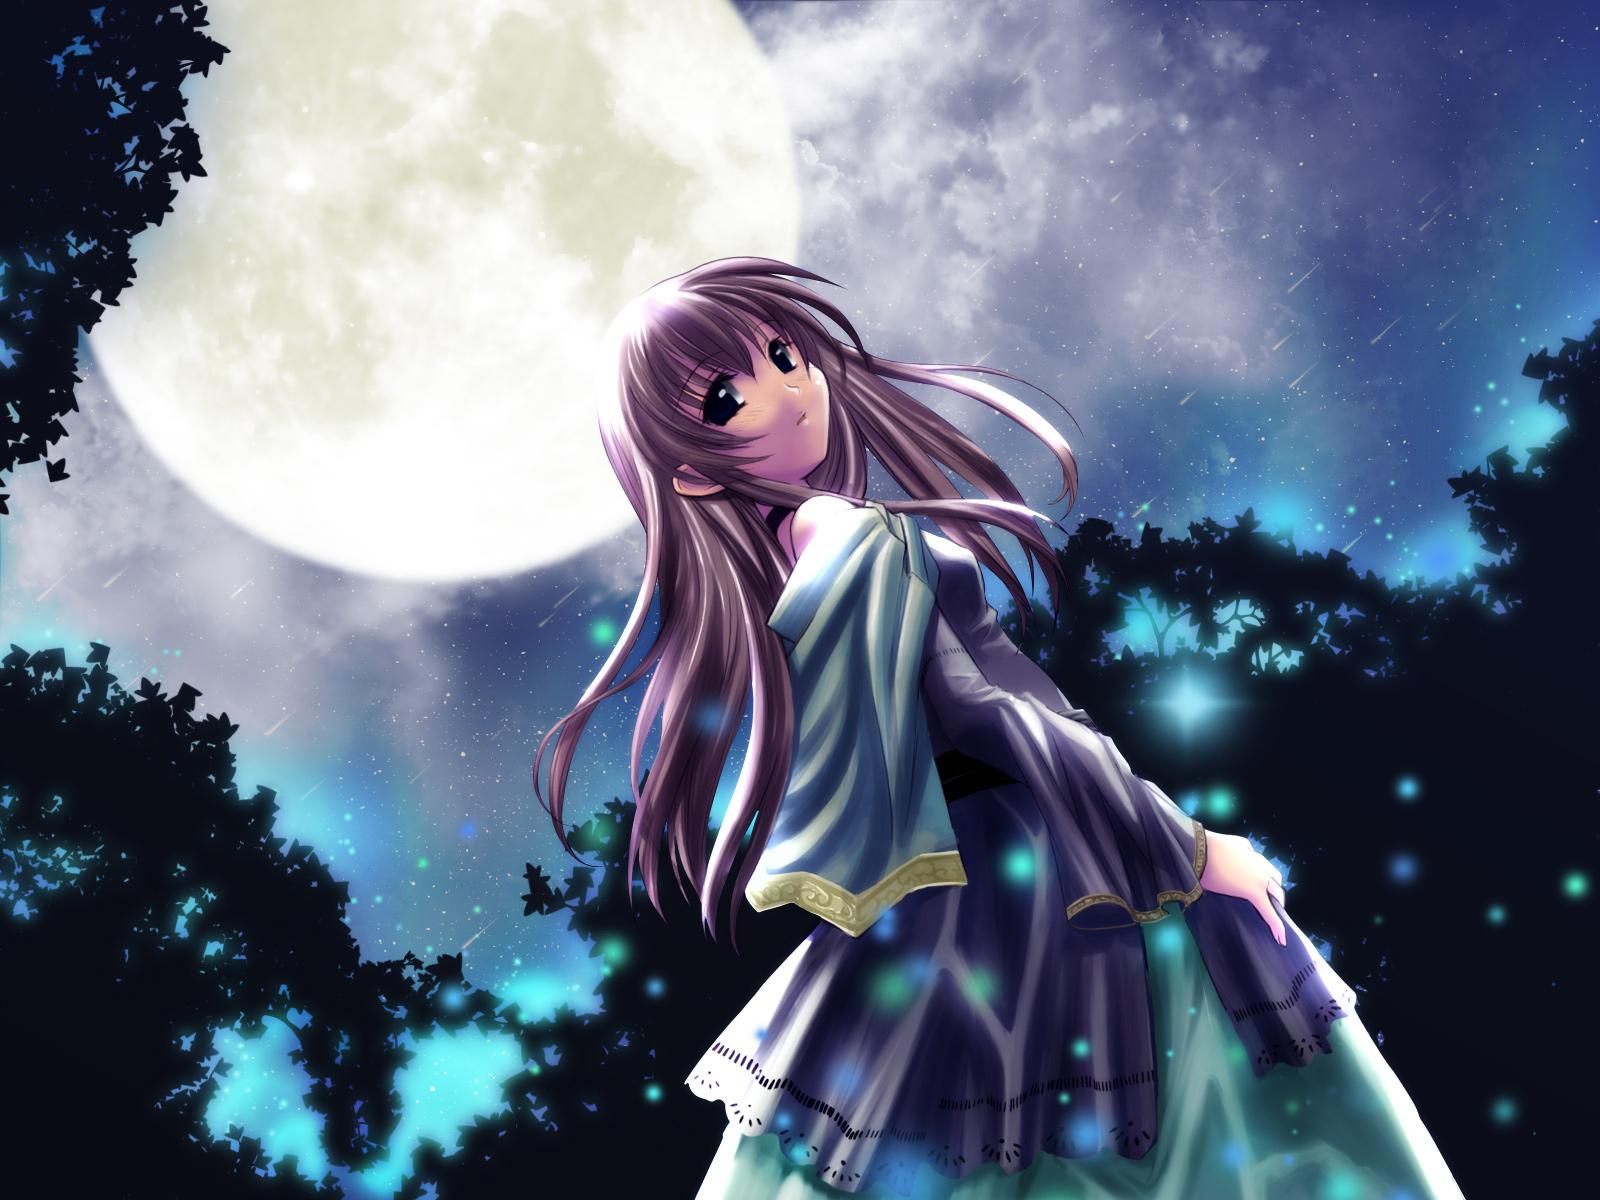 anime wallpaper hd 1600x1200